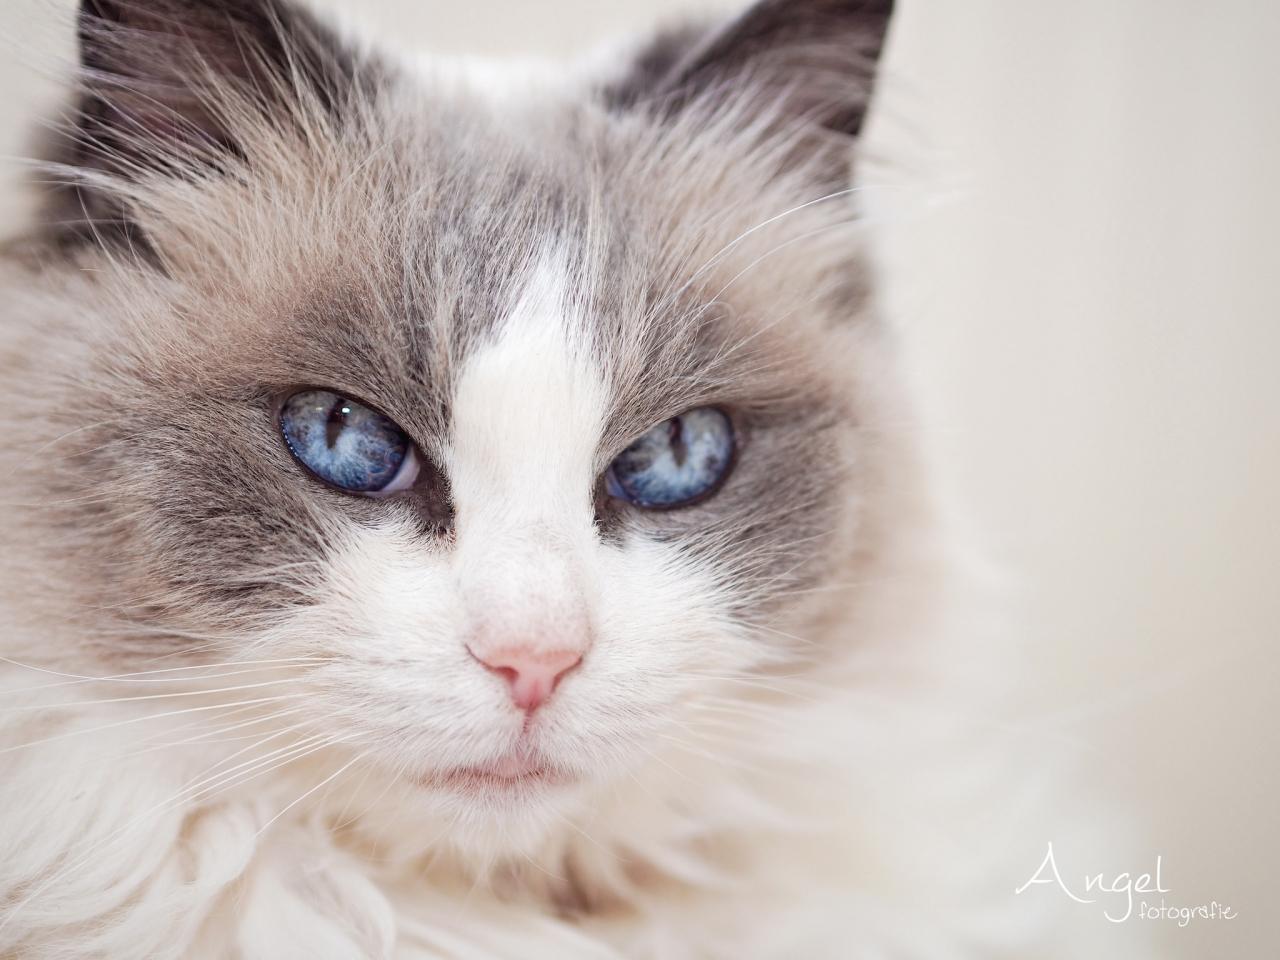 Gatos hermosos - 1280x960